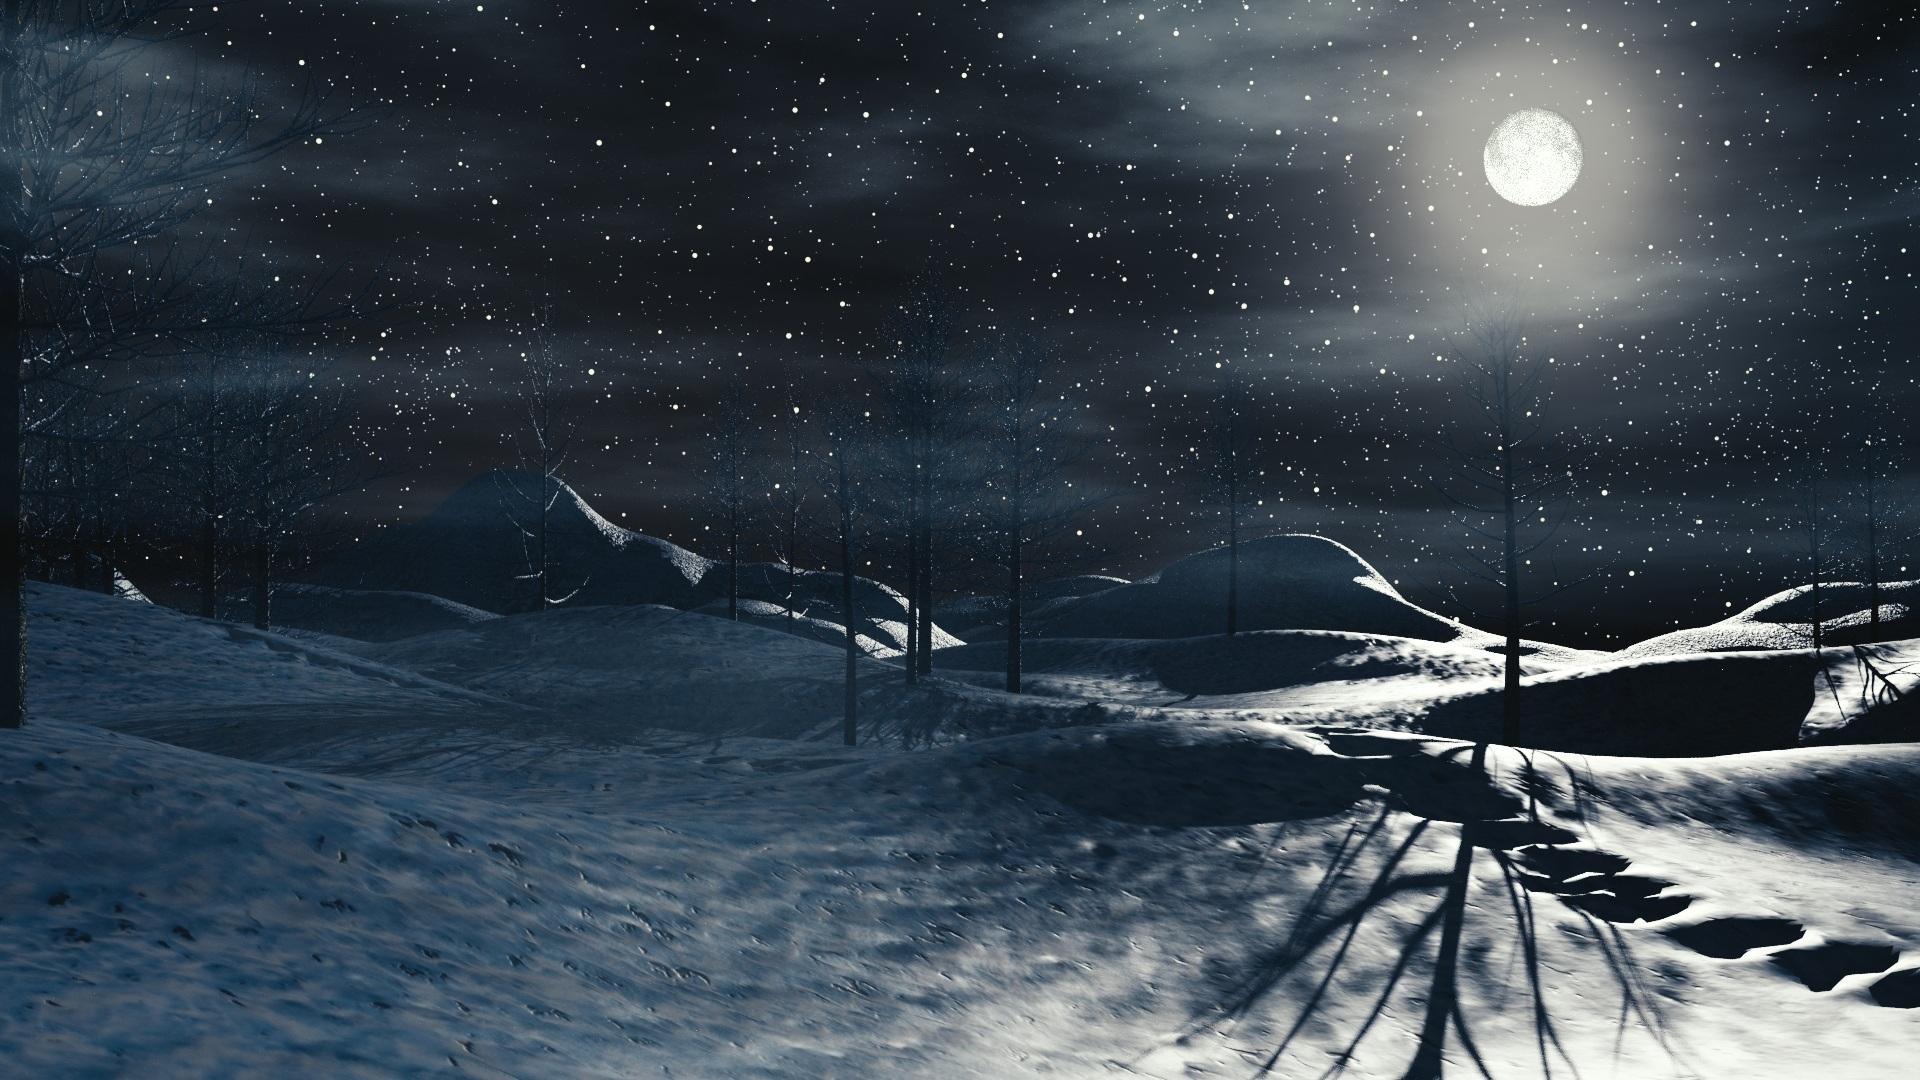 superluna plina in rac - sfatulparintilor.ro - pixabay_com - snow-1350948